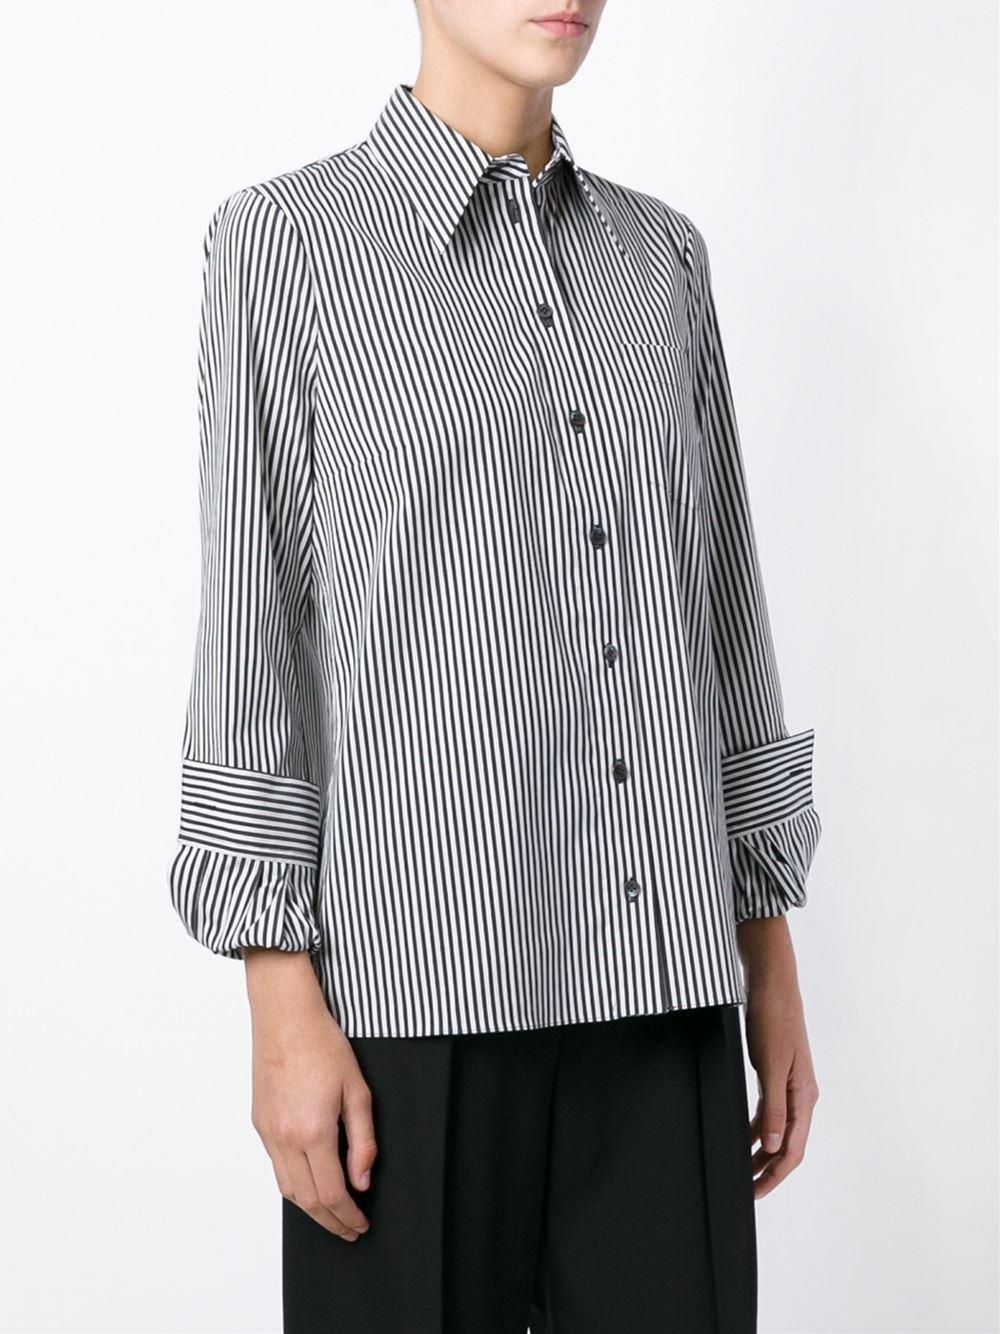 michael kors pinstripe shirt in black lyst. Black Bedroom Furniture Sets. Home Design Ideas